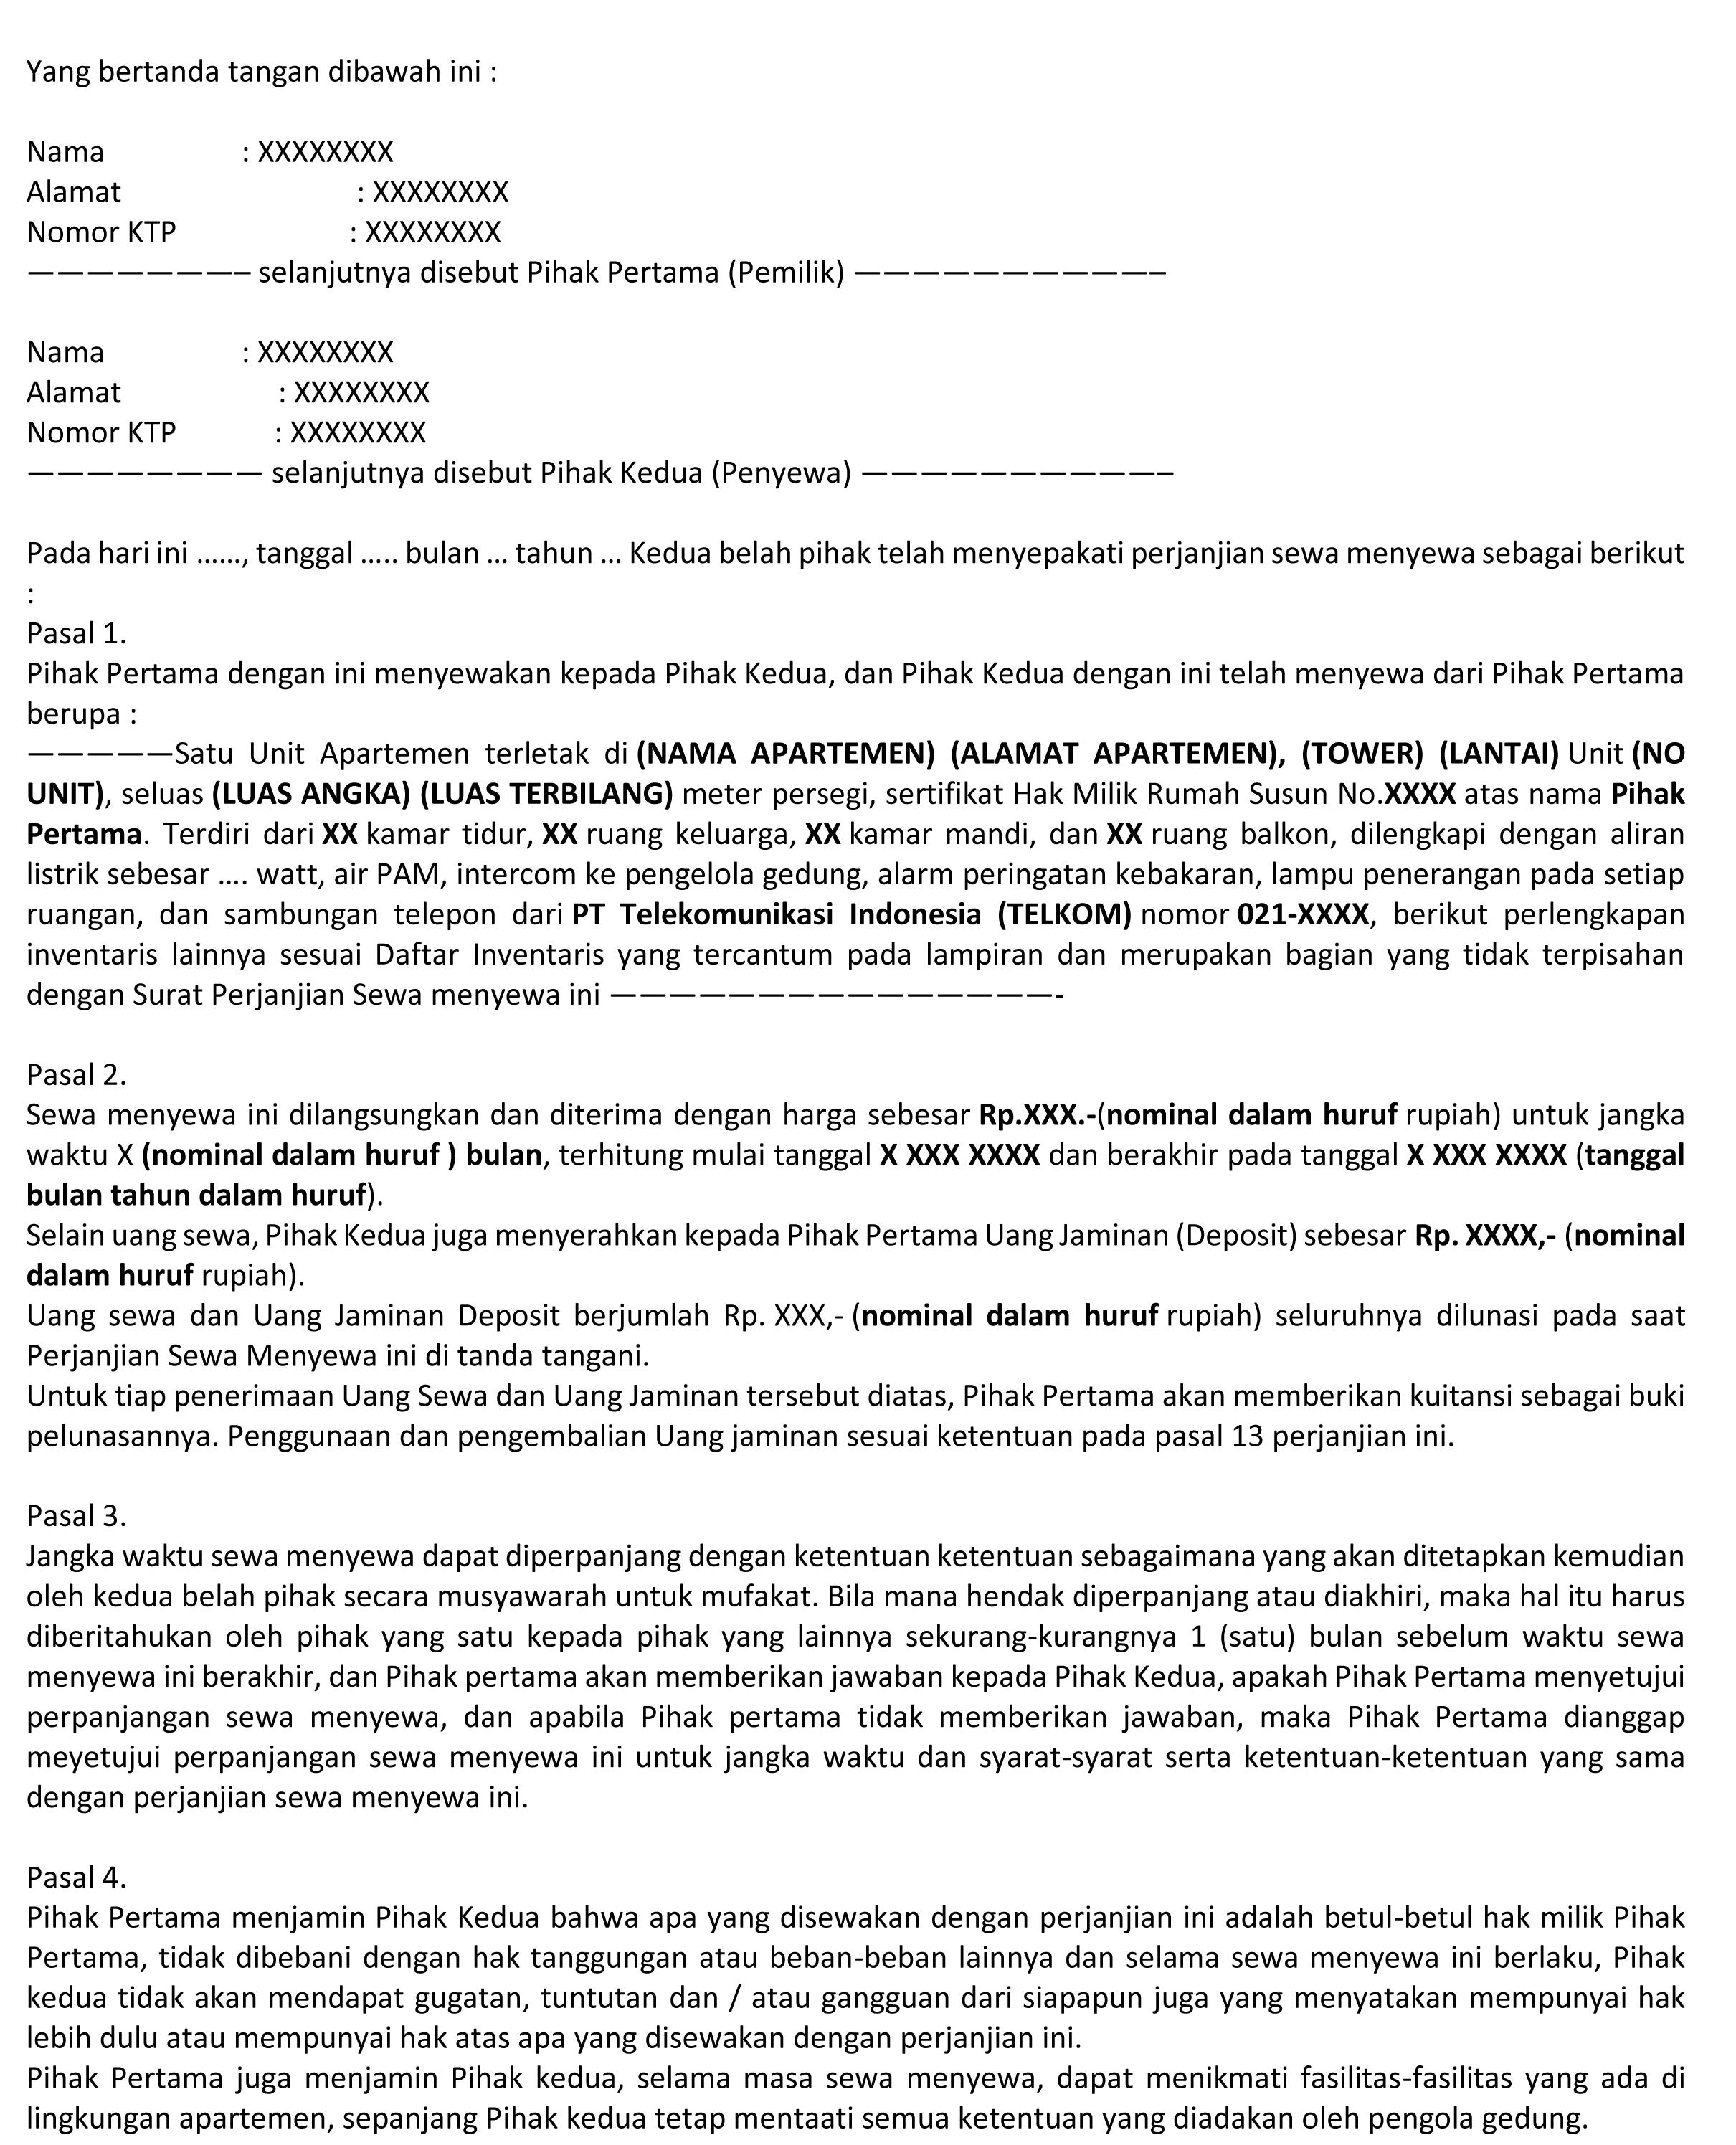 Contoh Surat Perjanjian Sewa Apartemen Yang Benar Jangan